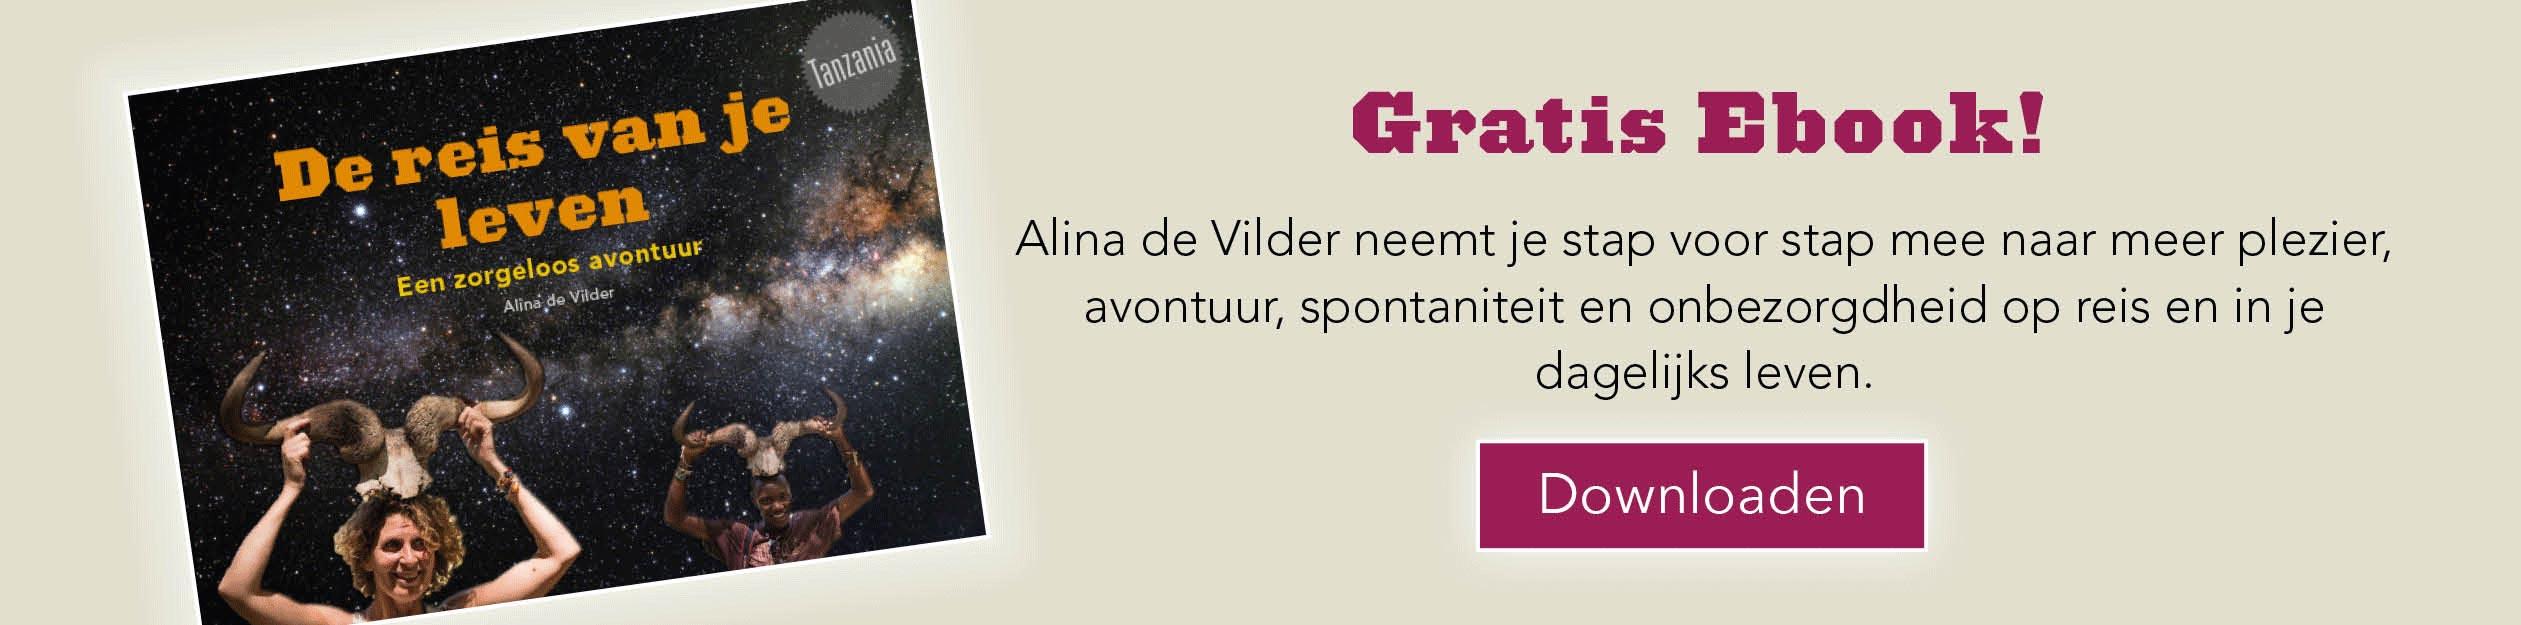 banner gratis e-book mindful adventure